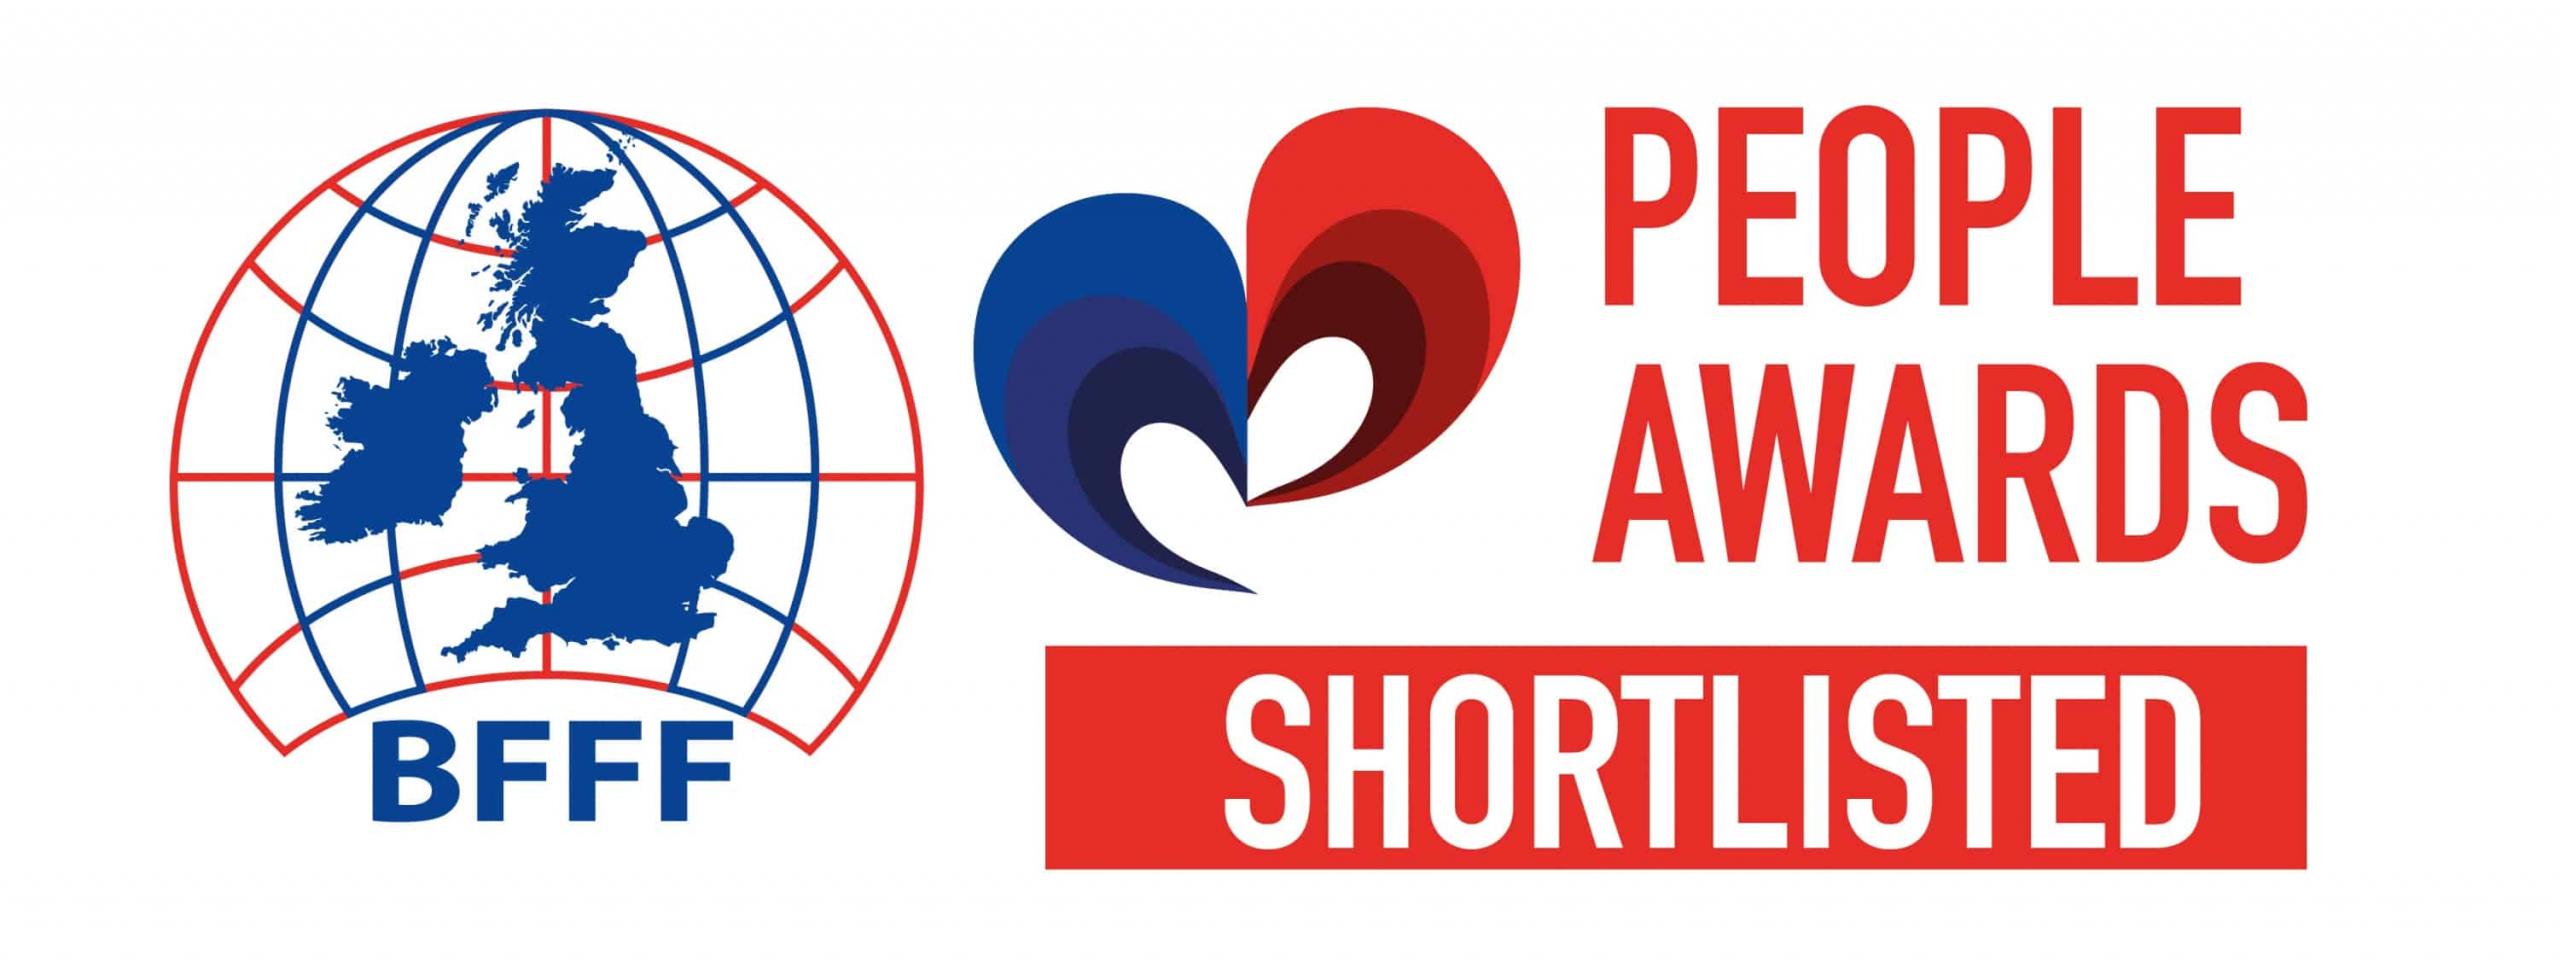 BFFF People Awards Logo_SHORTLIST